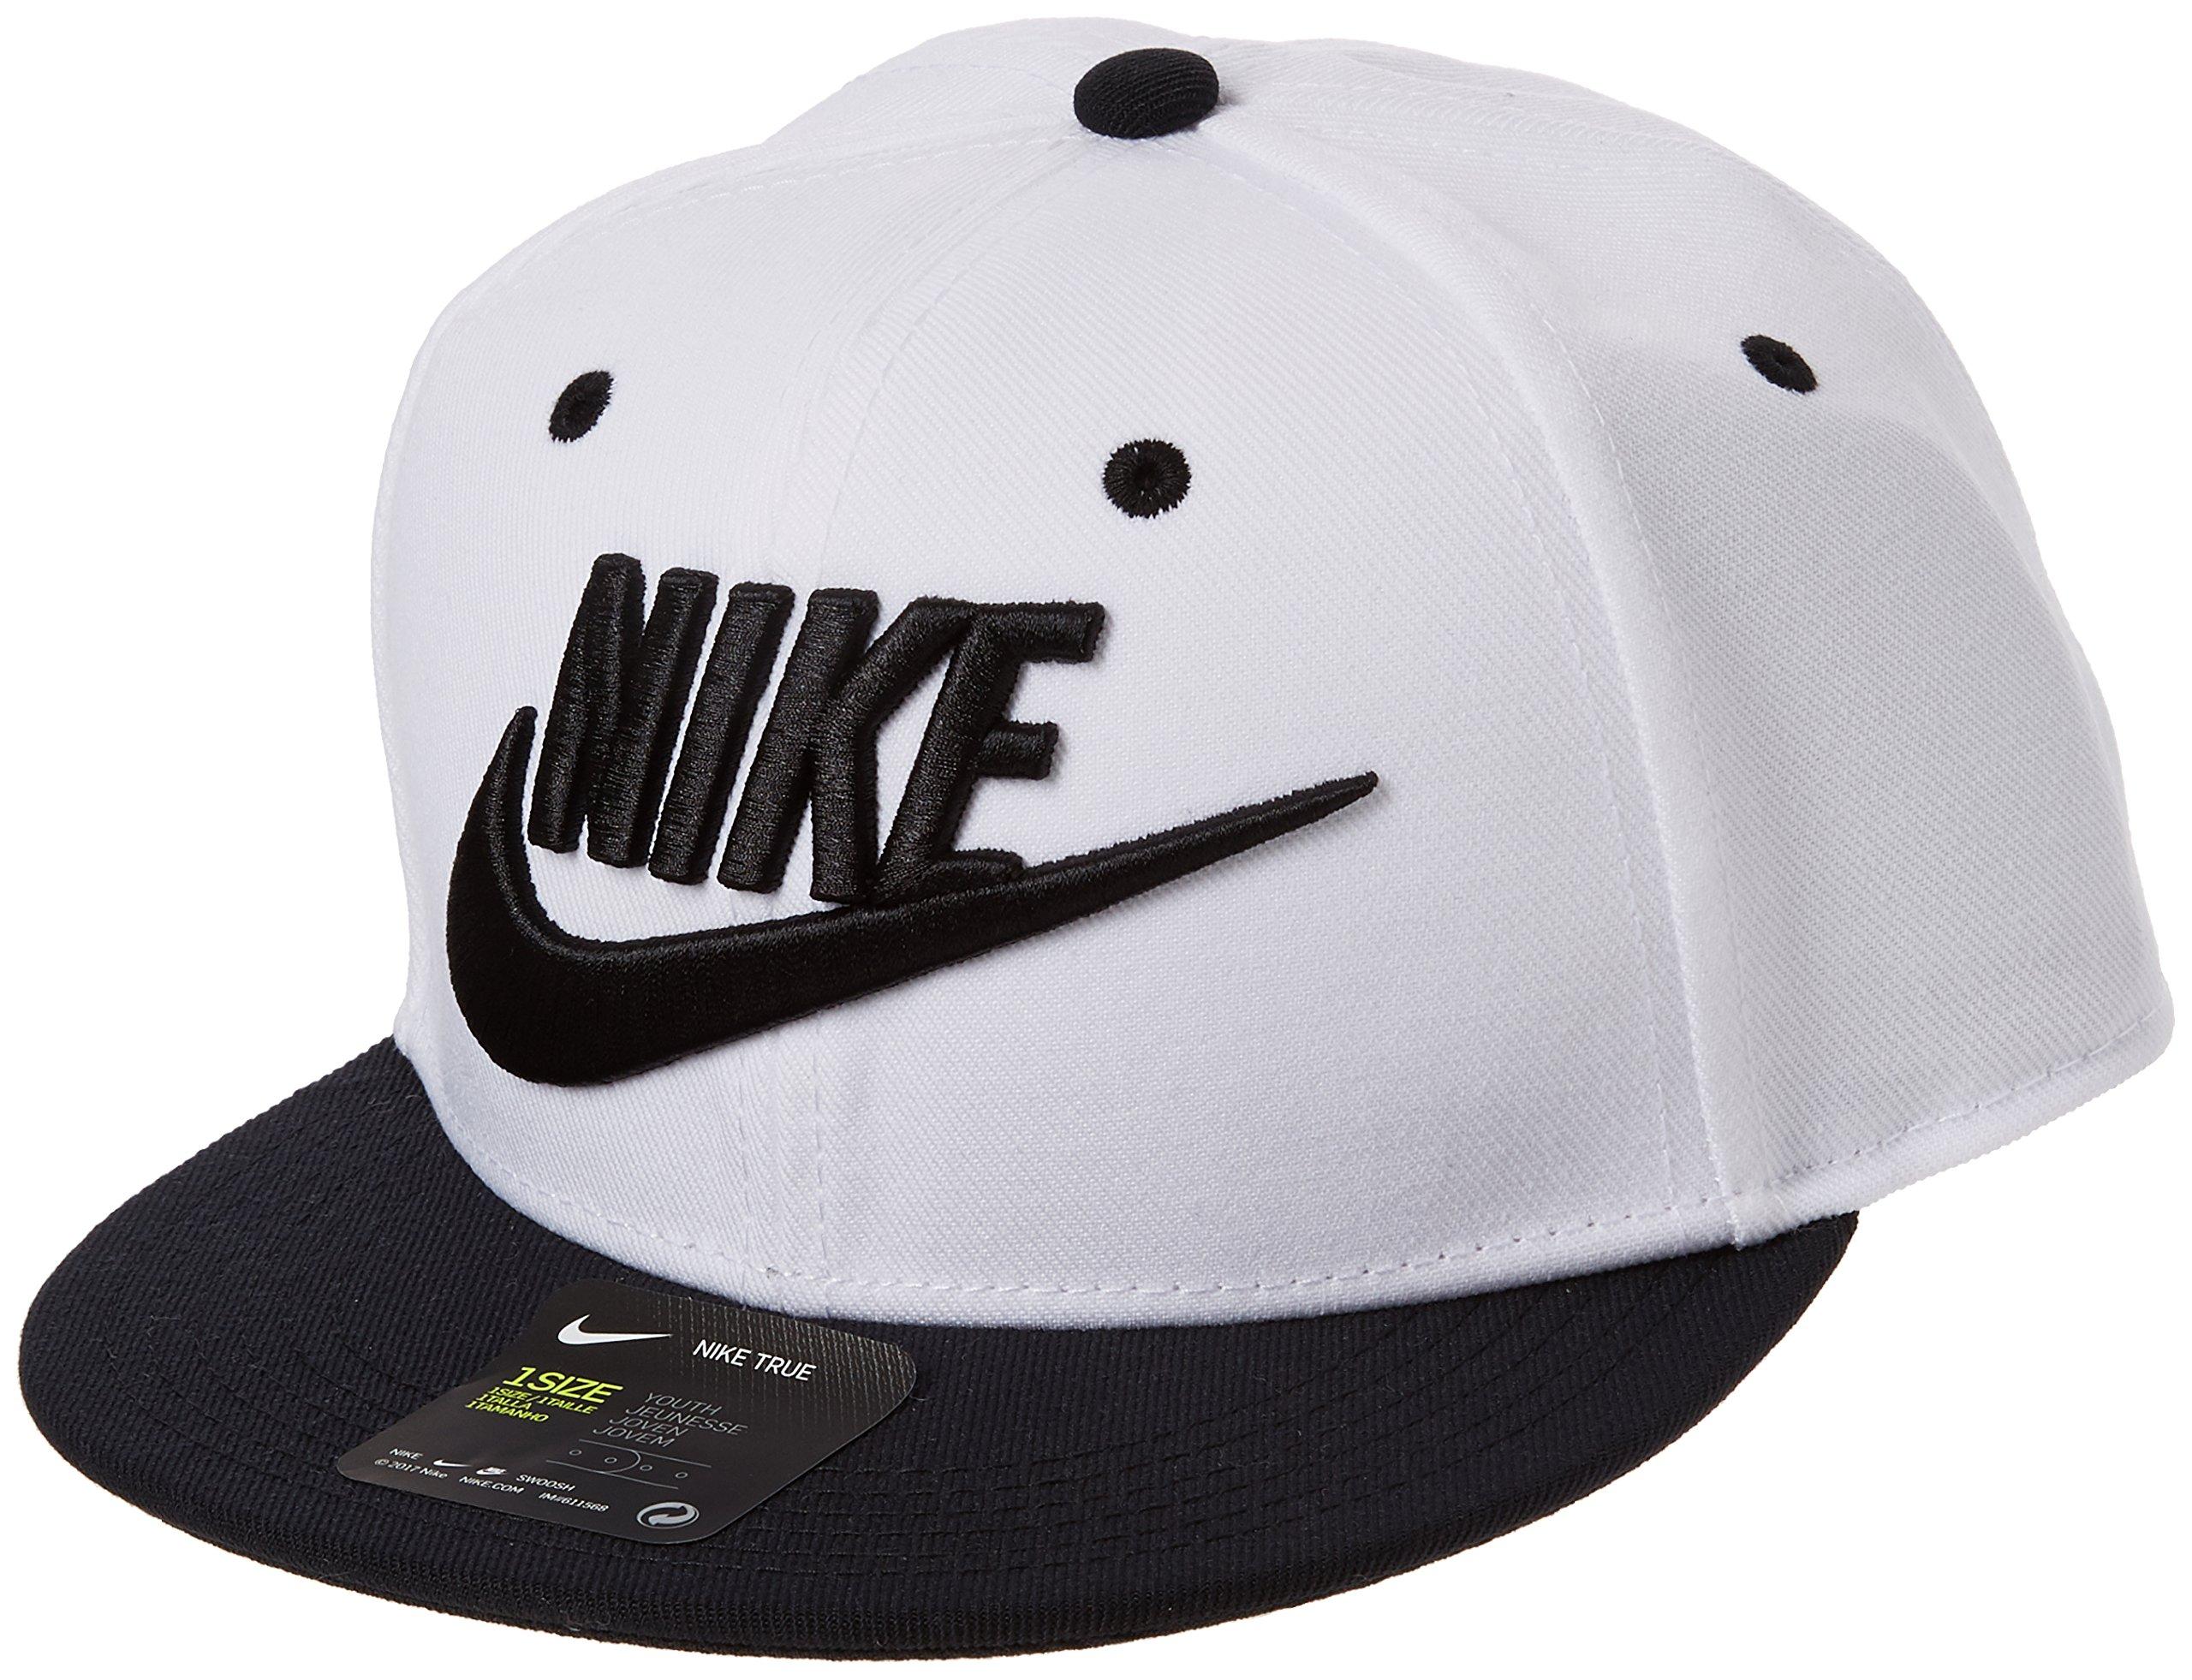 3f7735928403a Galleon - Nike Future True Snapback Cap Big Kids White/Black/Black/Black  Baseball Caps